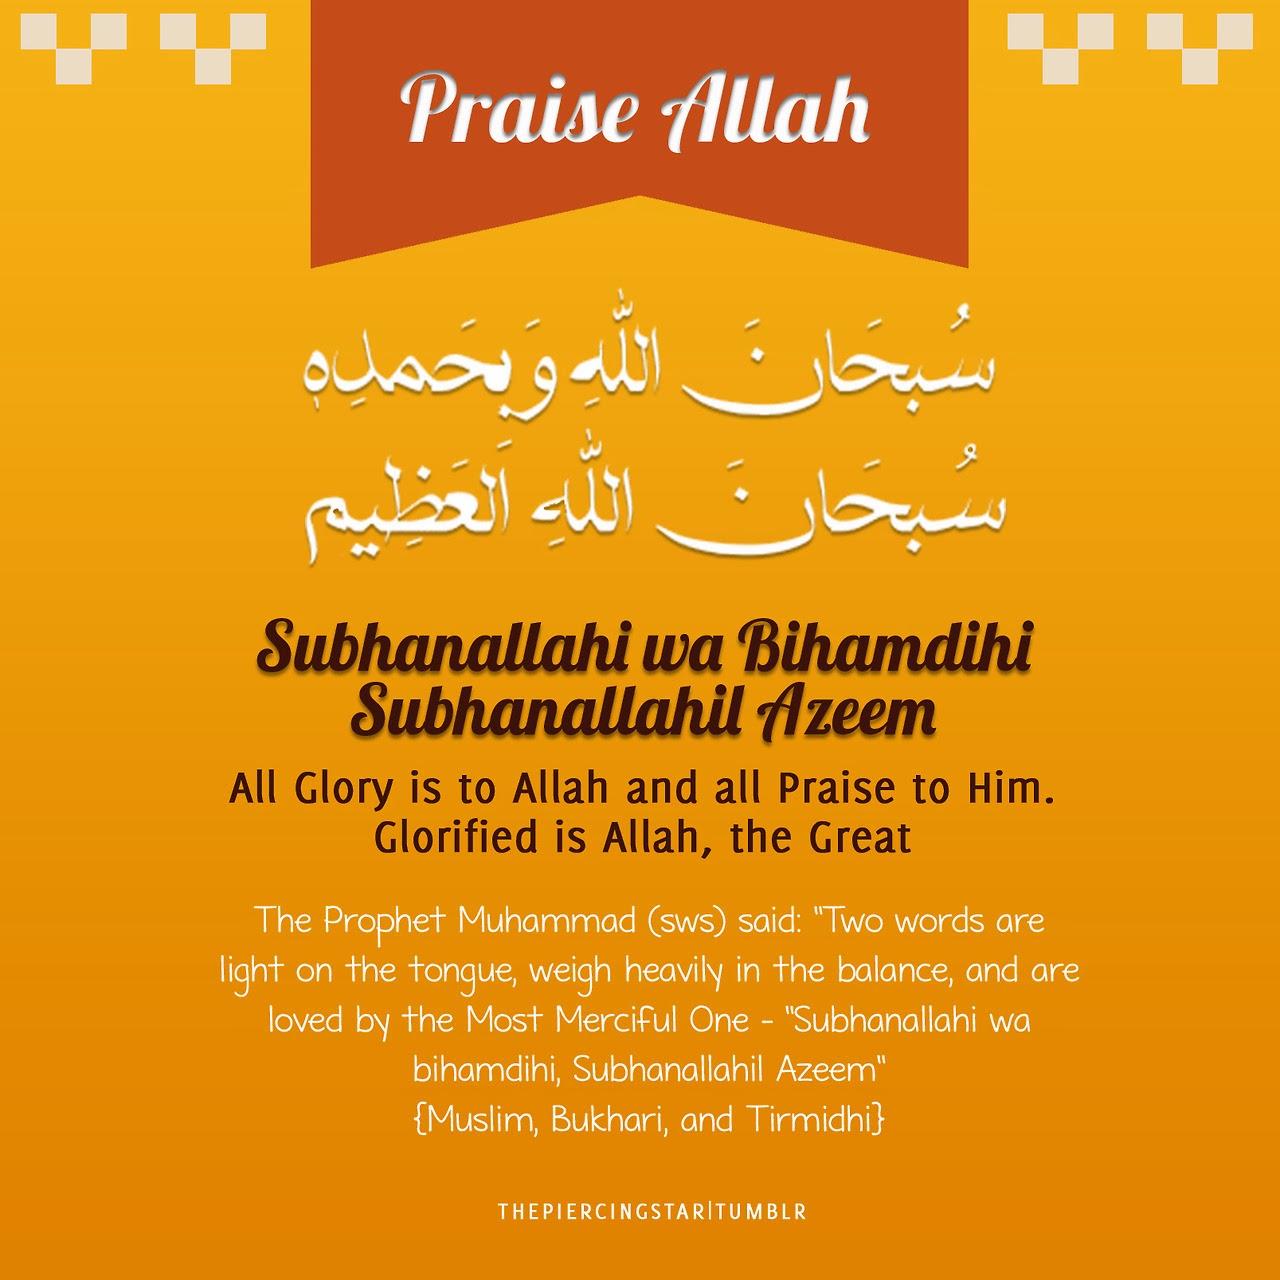 blog along25 kata-kata mutiara kata-kata hikmah petikan kata islamik islamic quote quotes tazkirah jumaat